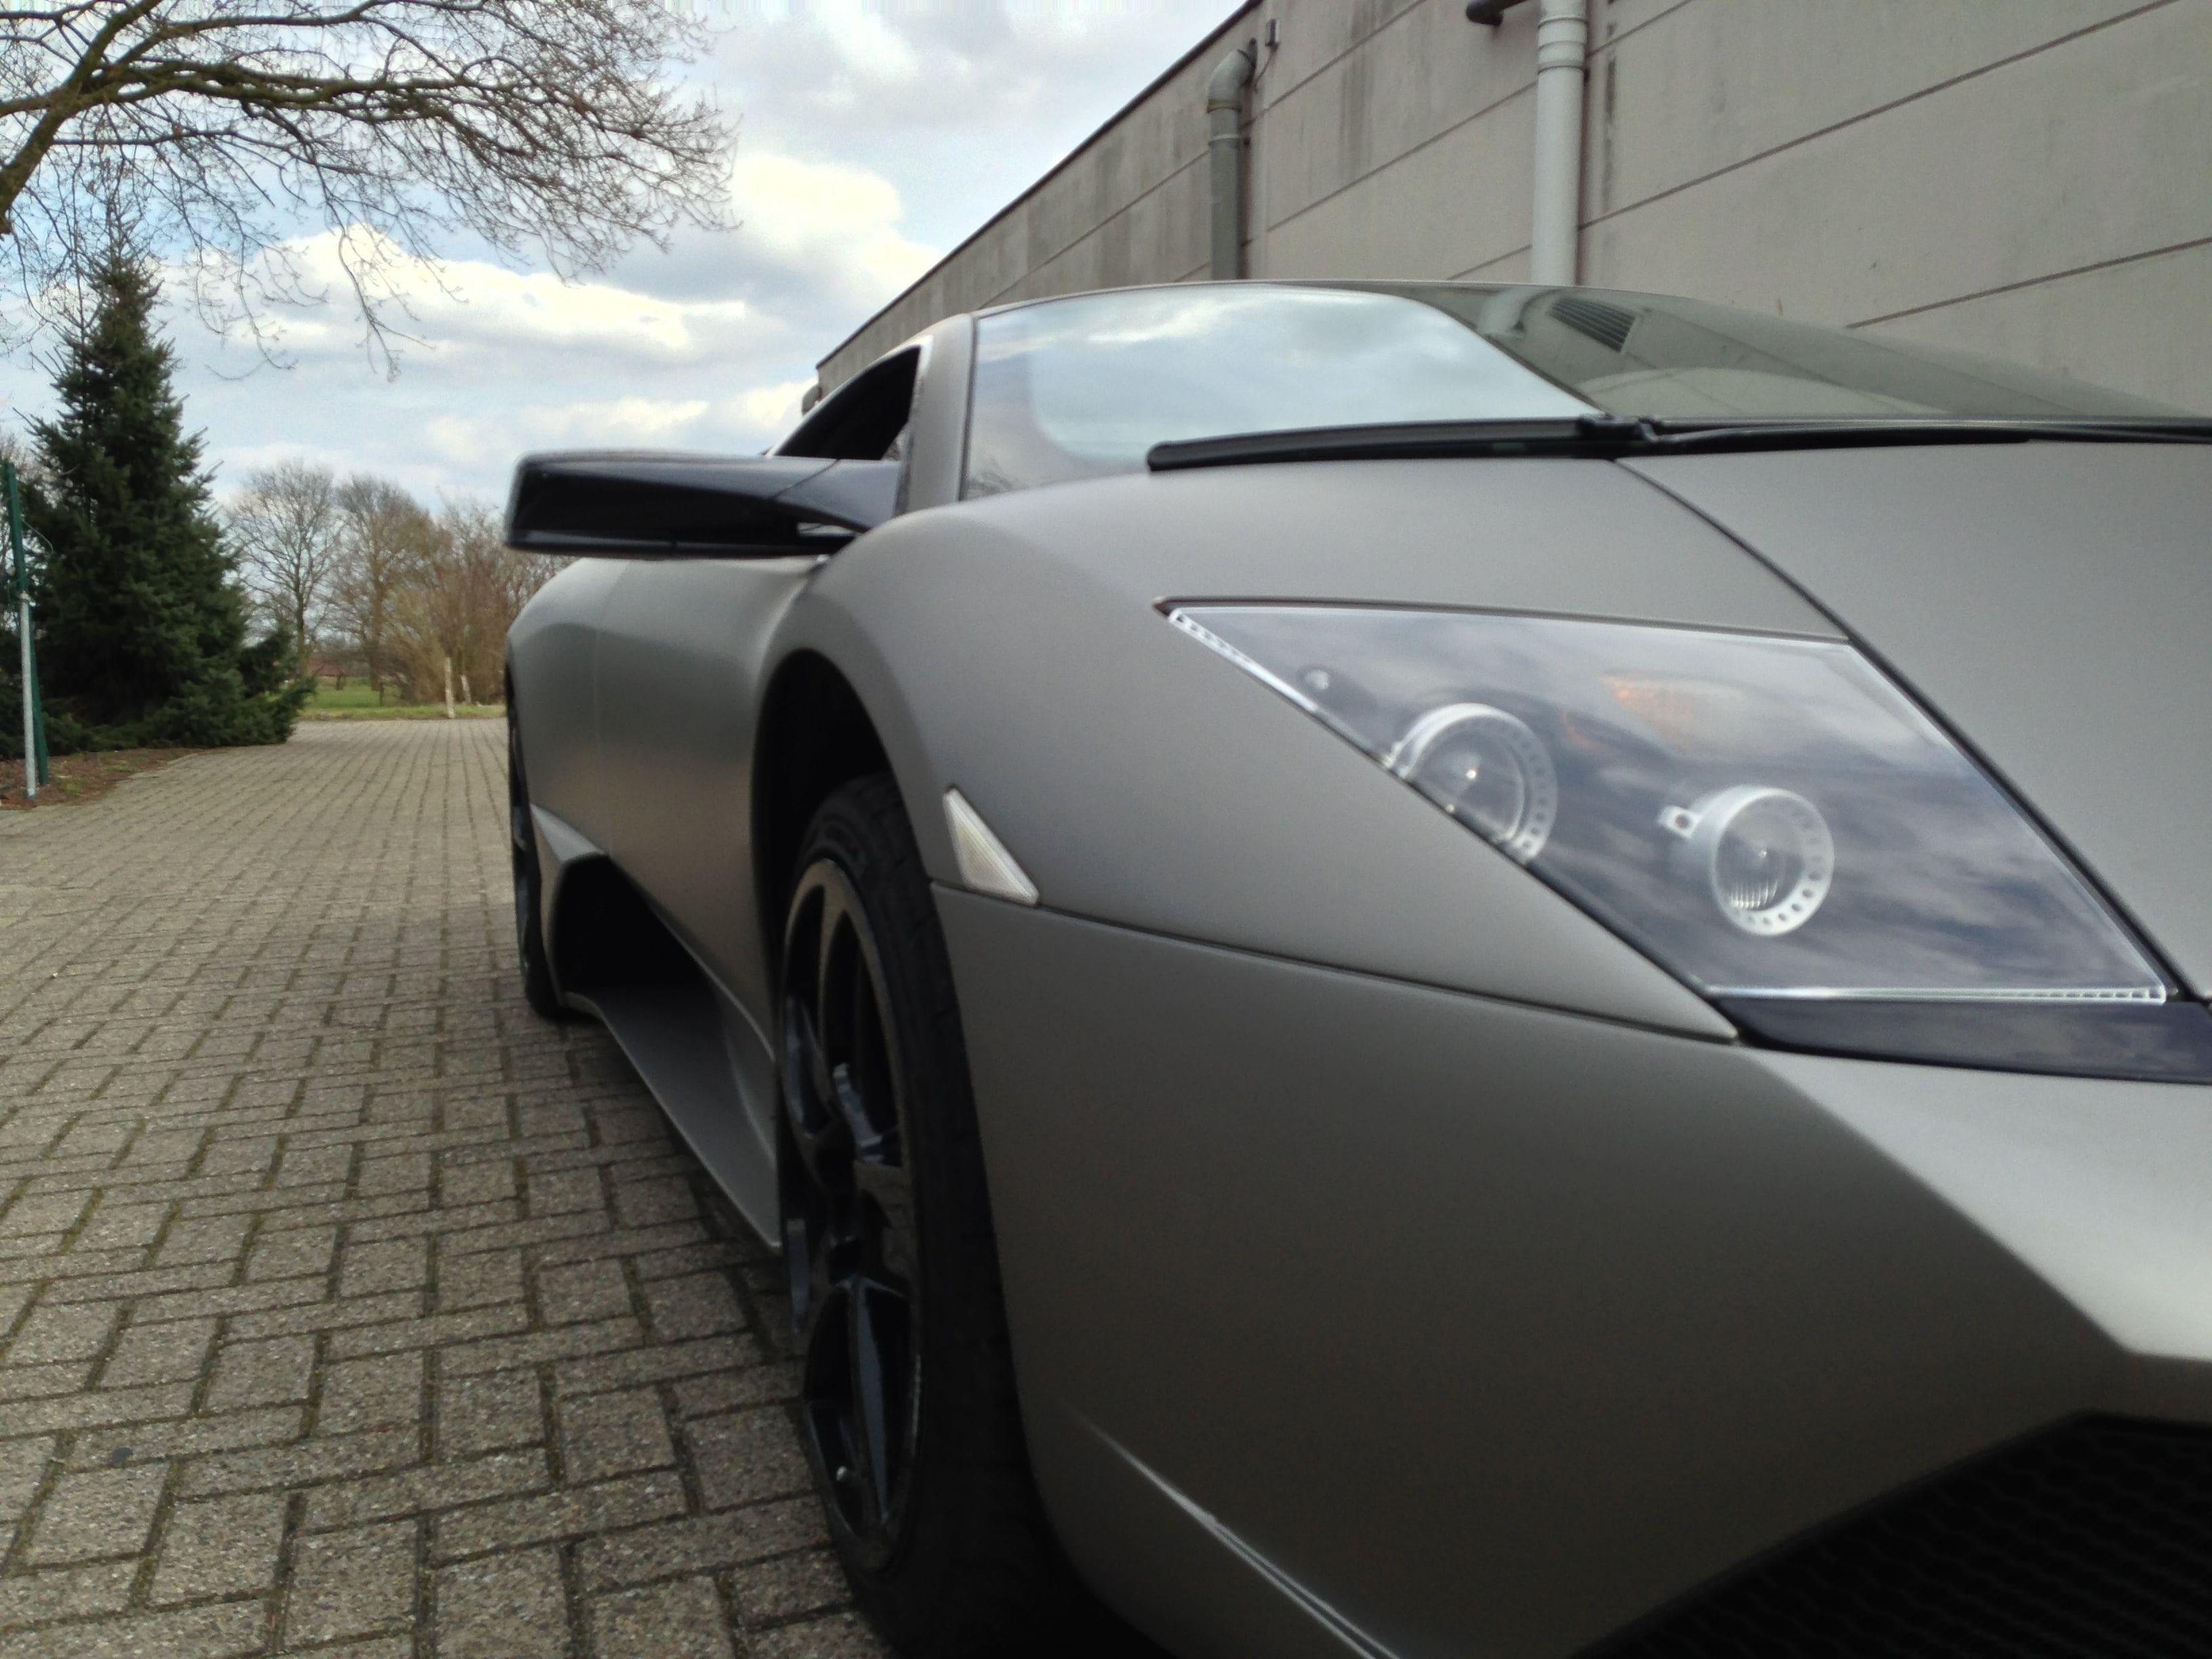 Lamborghini Murcialago LP670 met Gunpowder Wrap, Carwrapping door Wrapmyride.nu Foto-nr:5979, ©2021